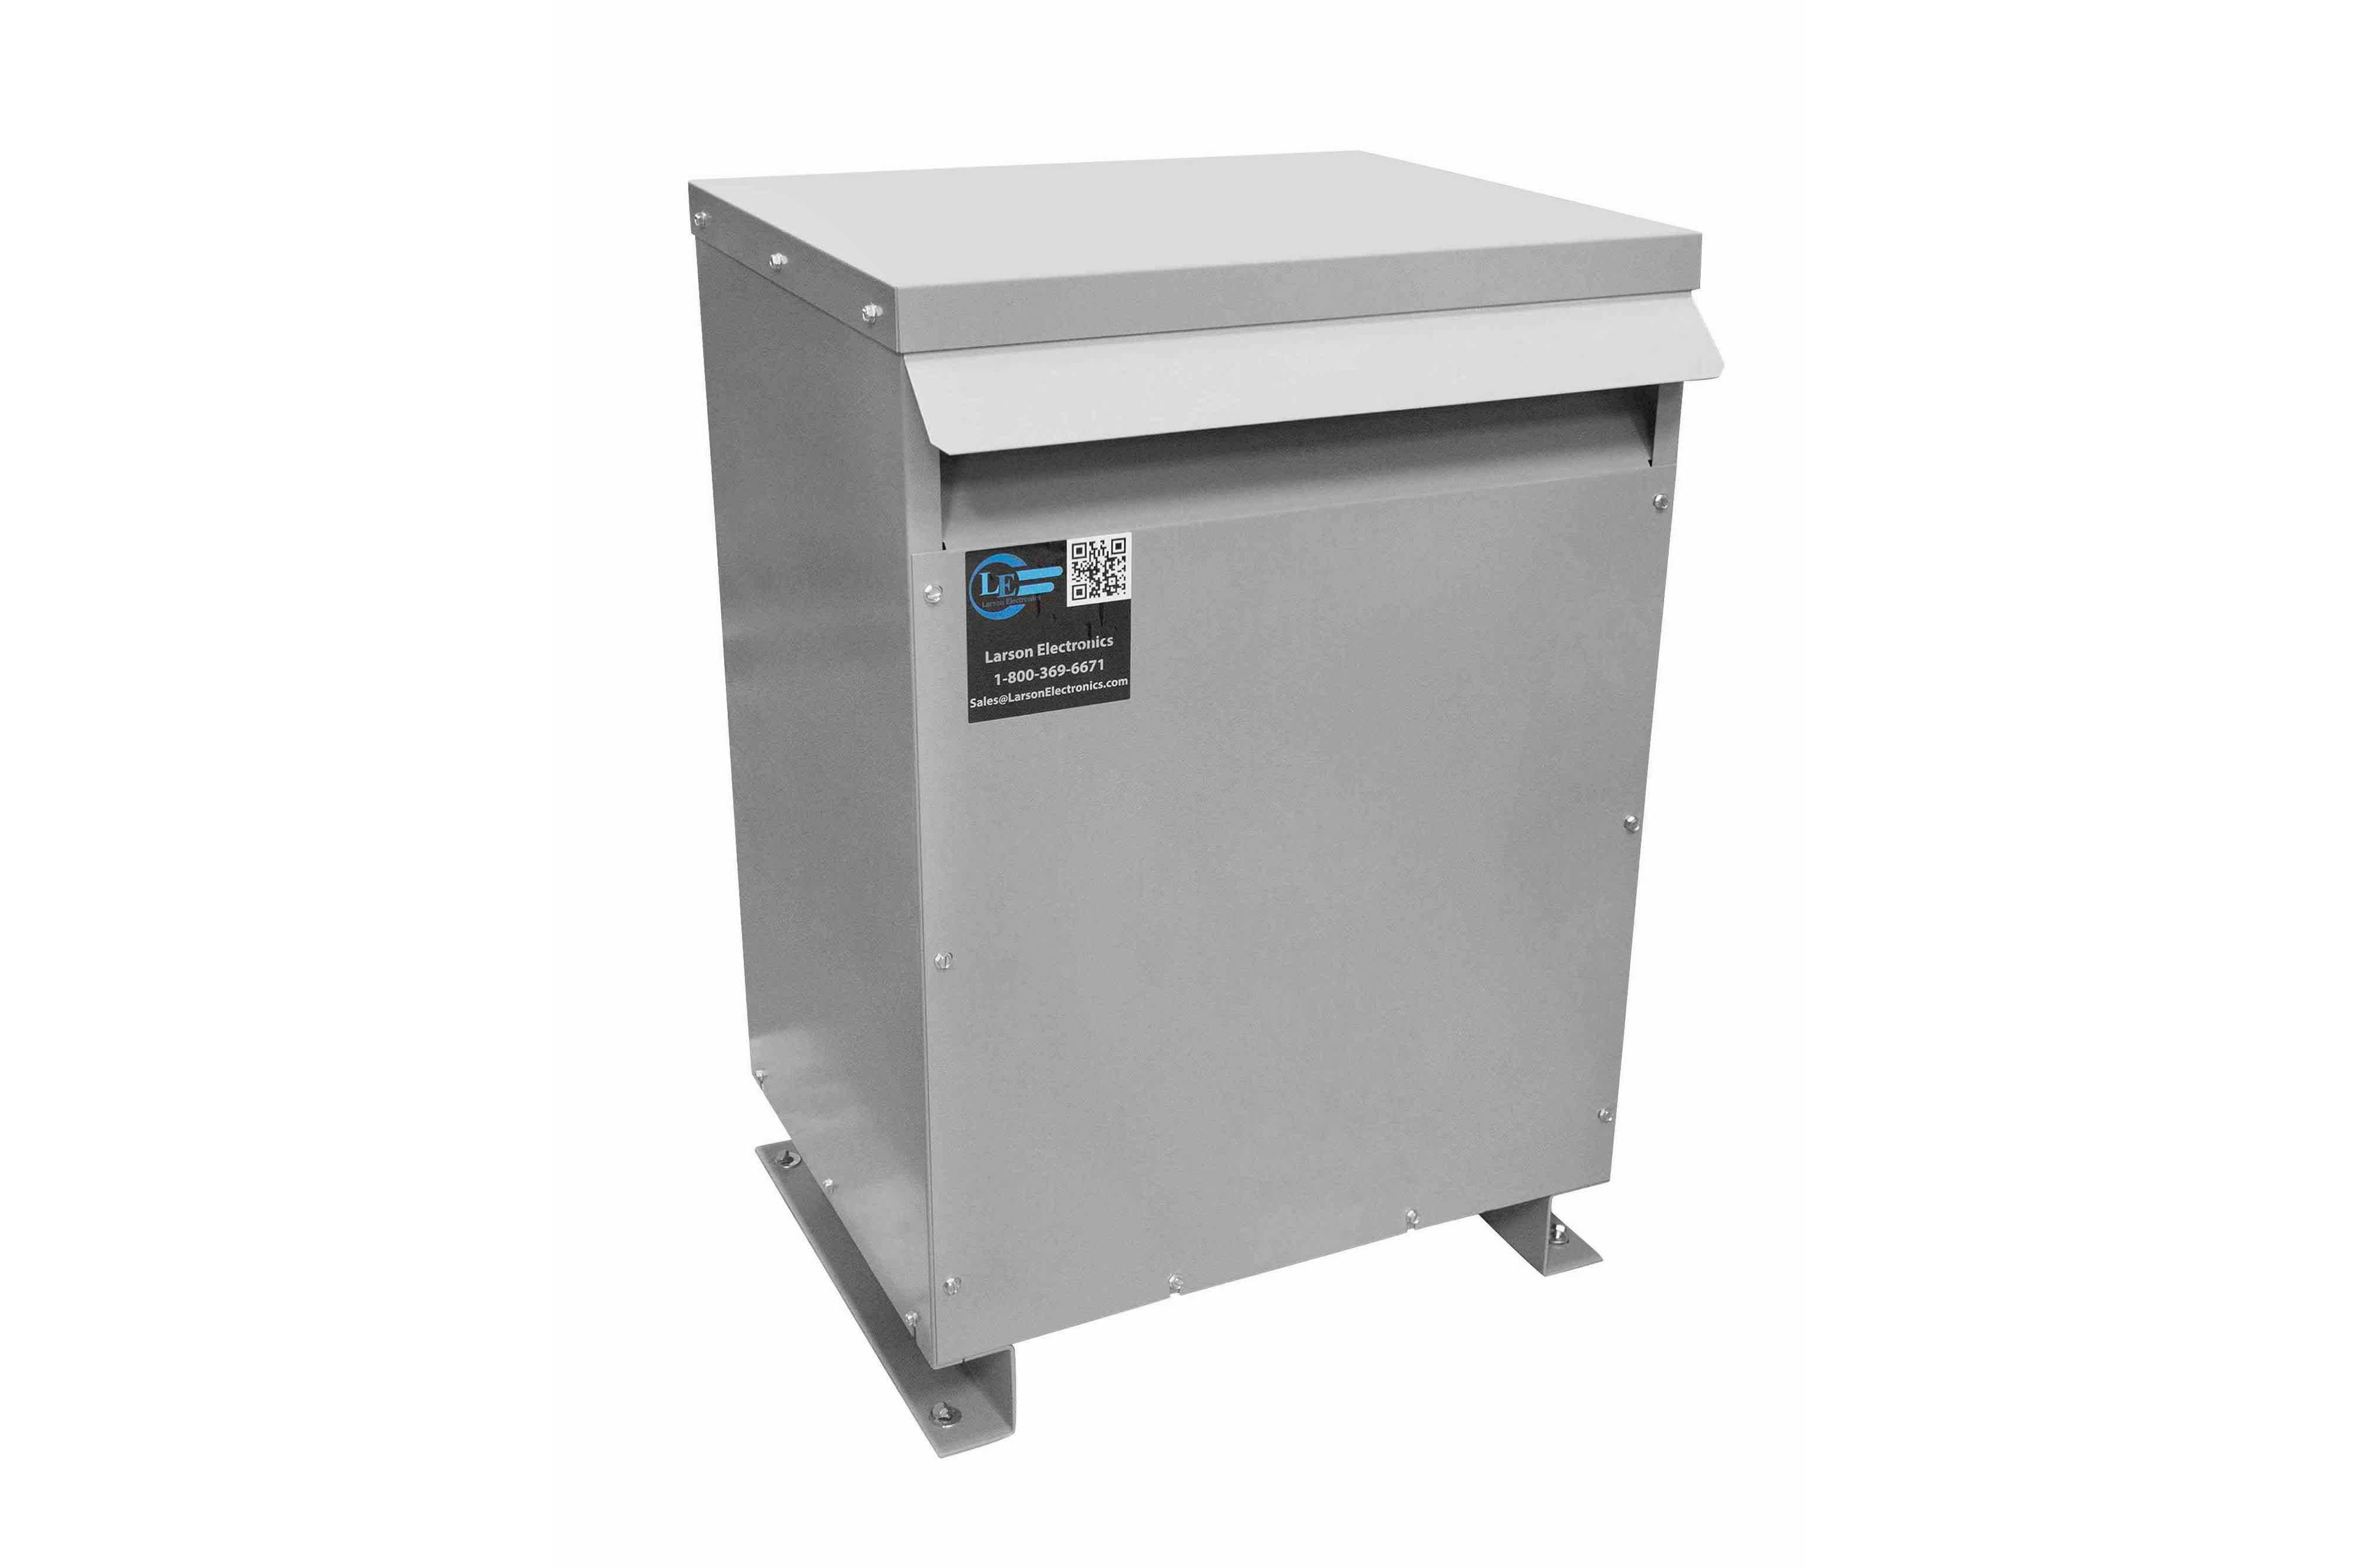 70 kVA 3PH Isolation Transformer, 230V Wye Primary, 208Y/120 Wye-N Secondary, N3R, Ventilated, 60 Hz